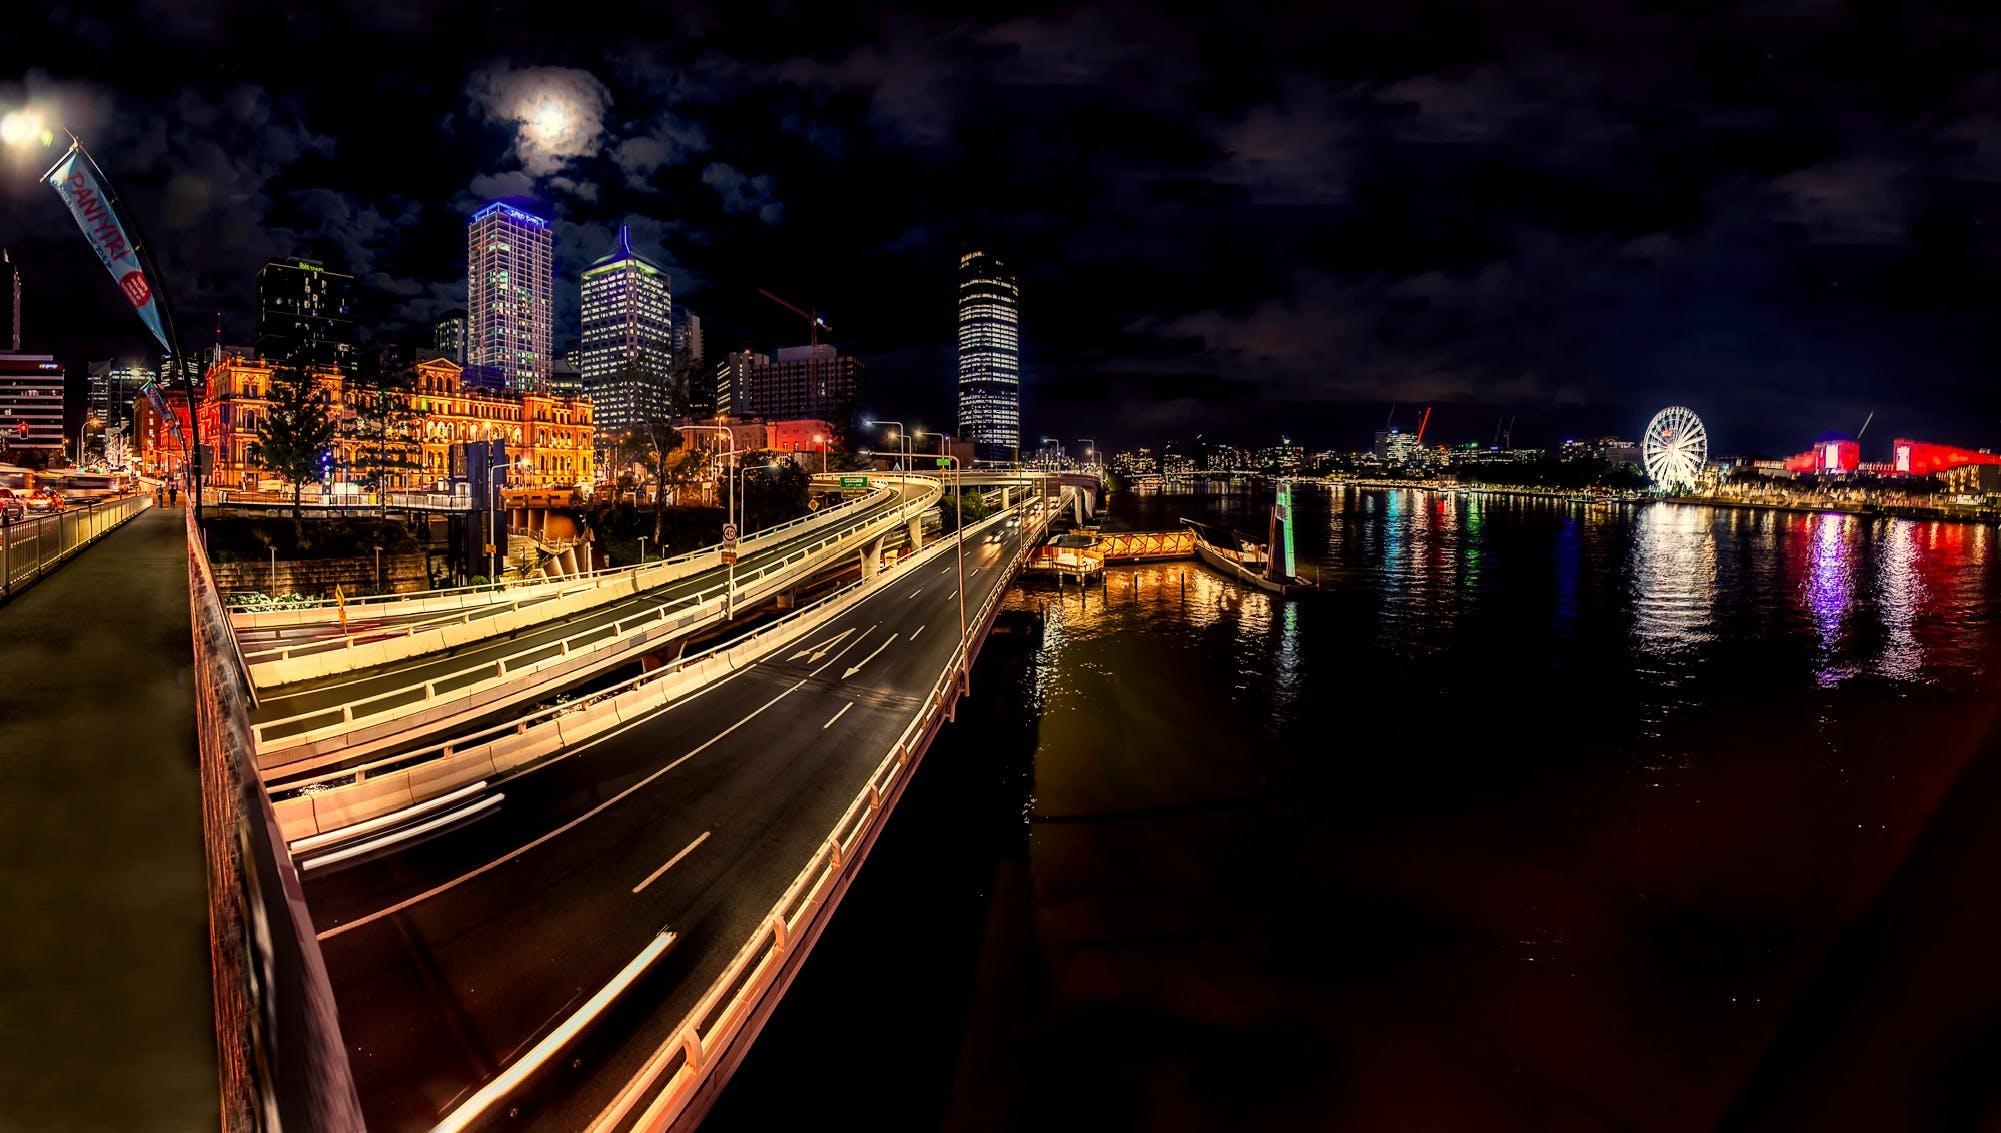 Time-lapse Photography of Moving Vehicles on Bridge